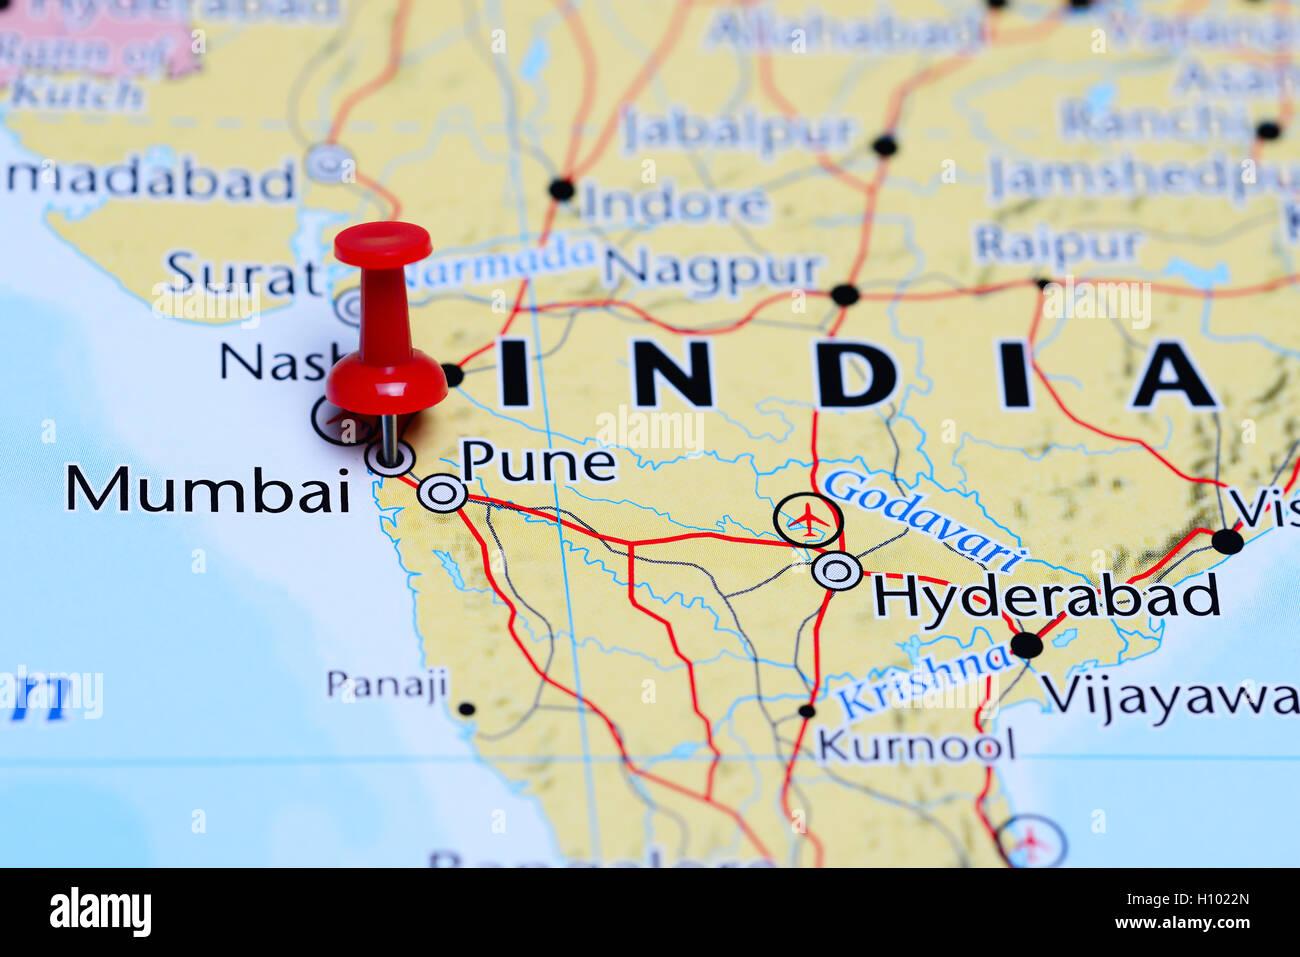 Mumbai pinned on a map of India Stock Photo 121088877 Alamy